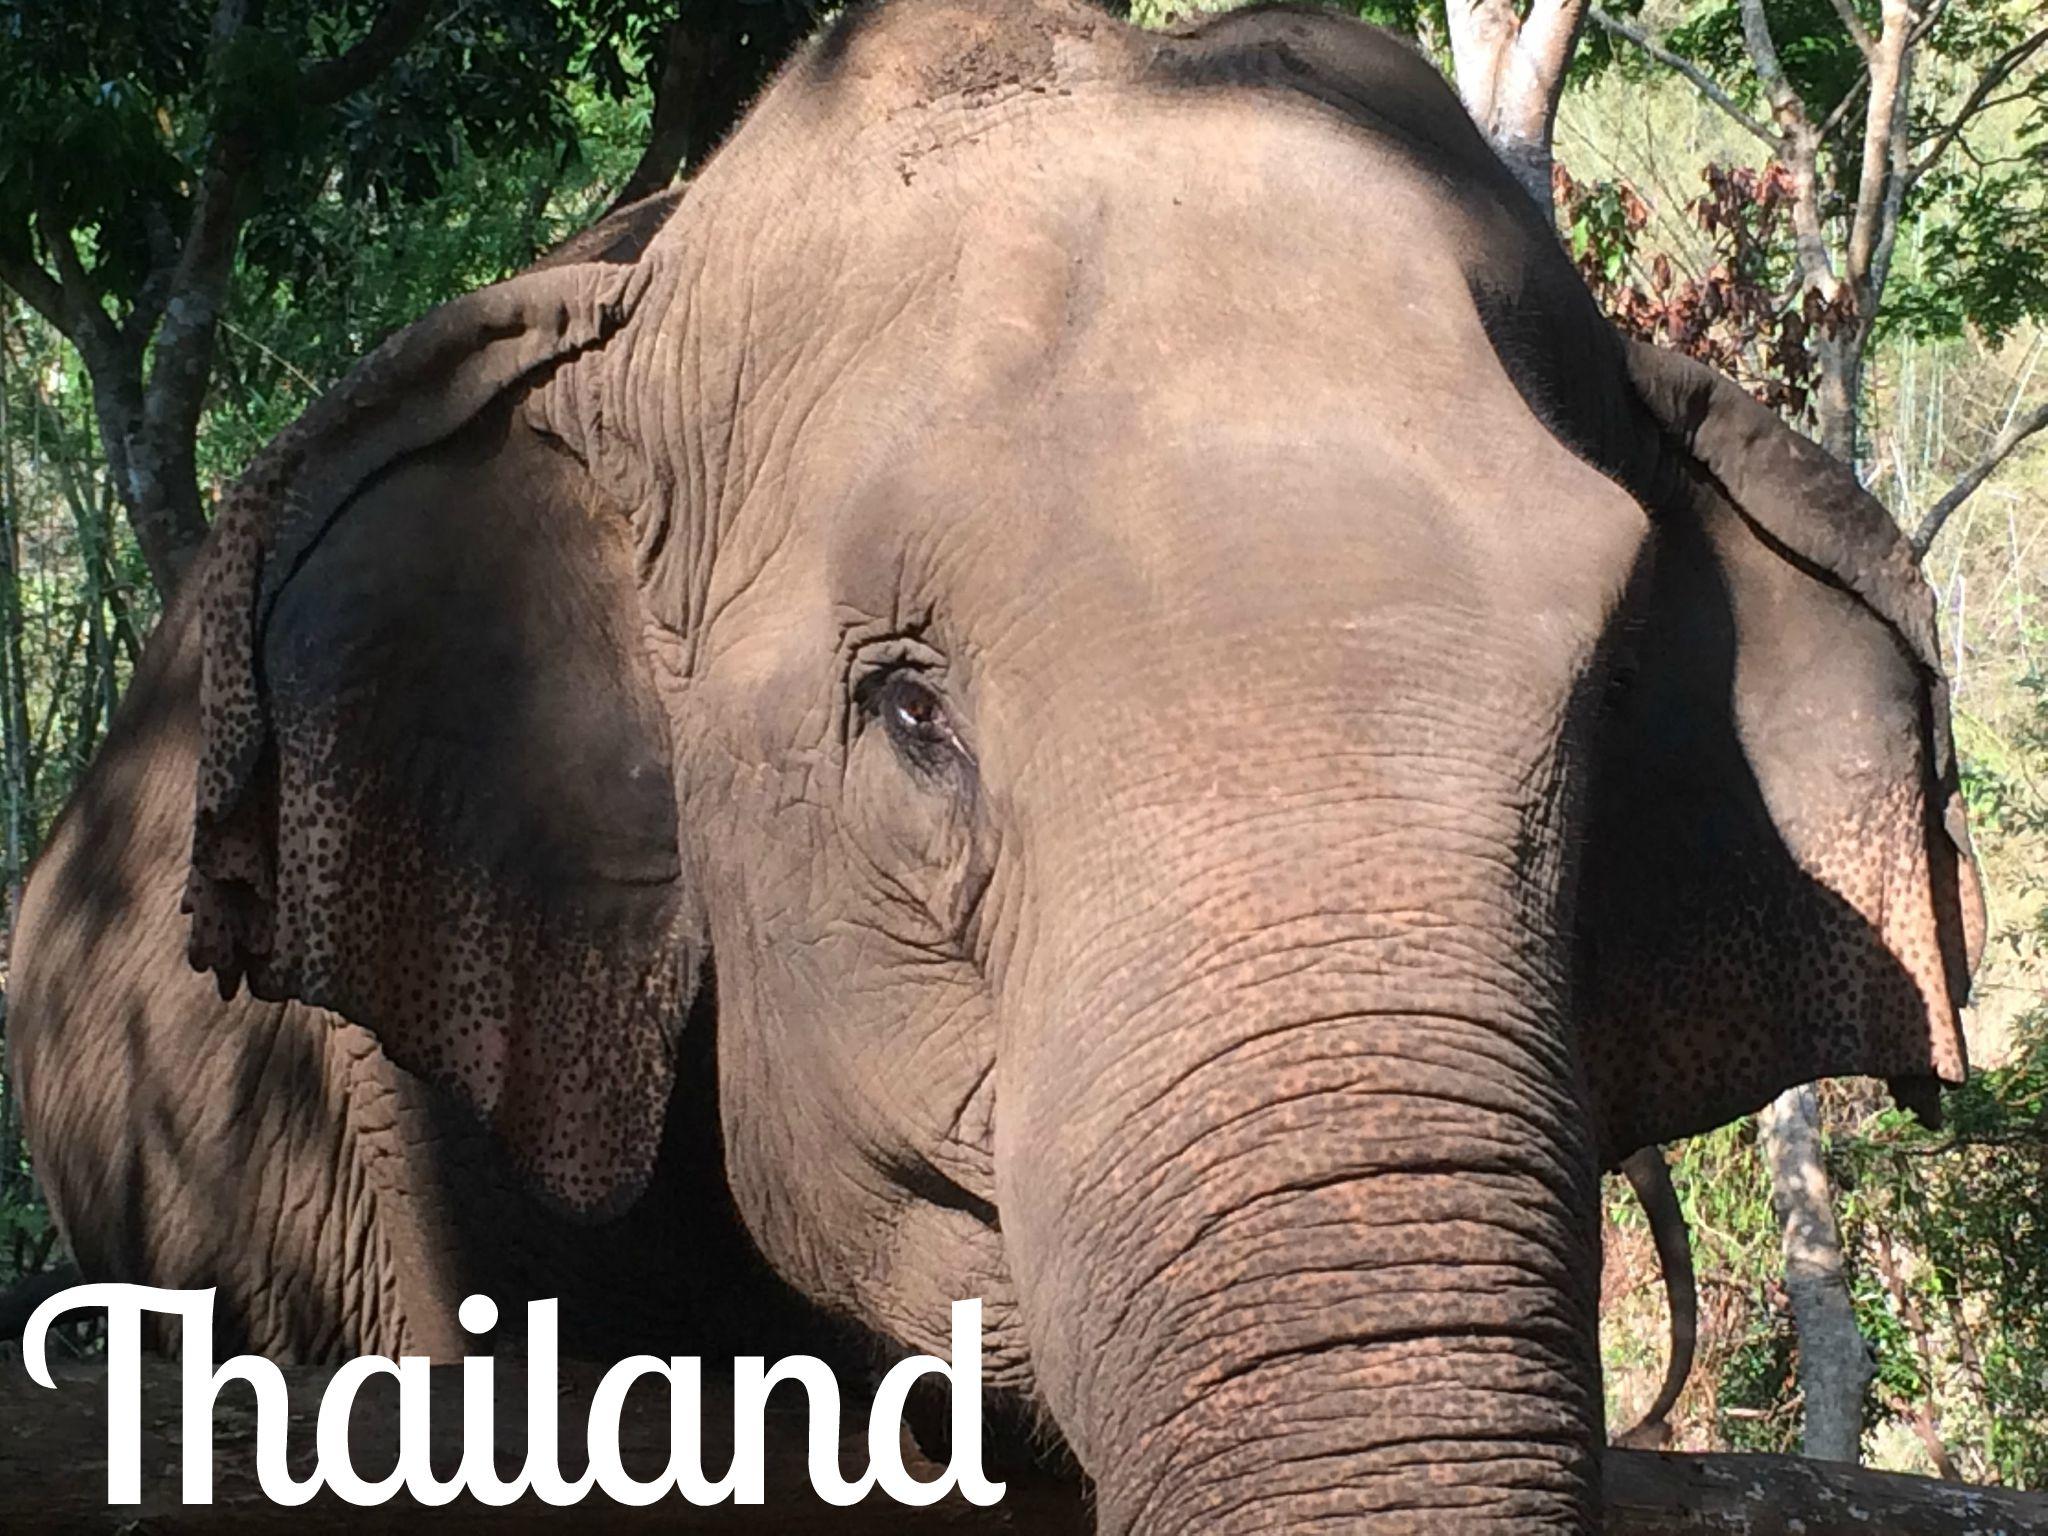 Thailand - Wanderalot